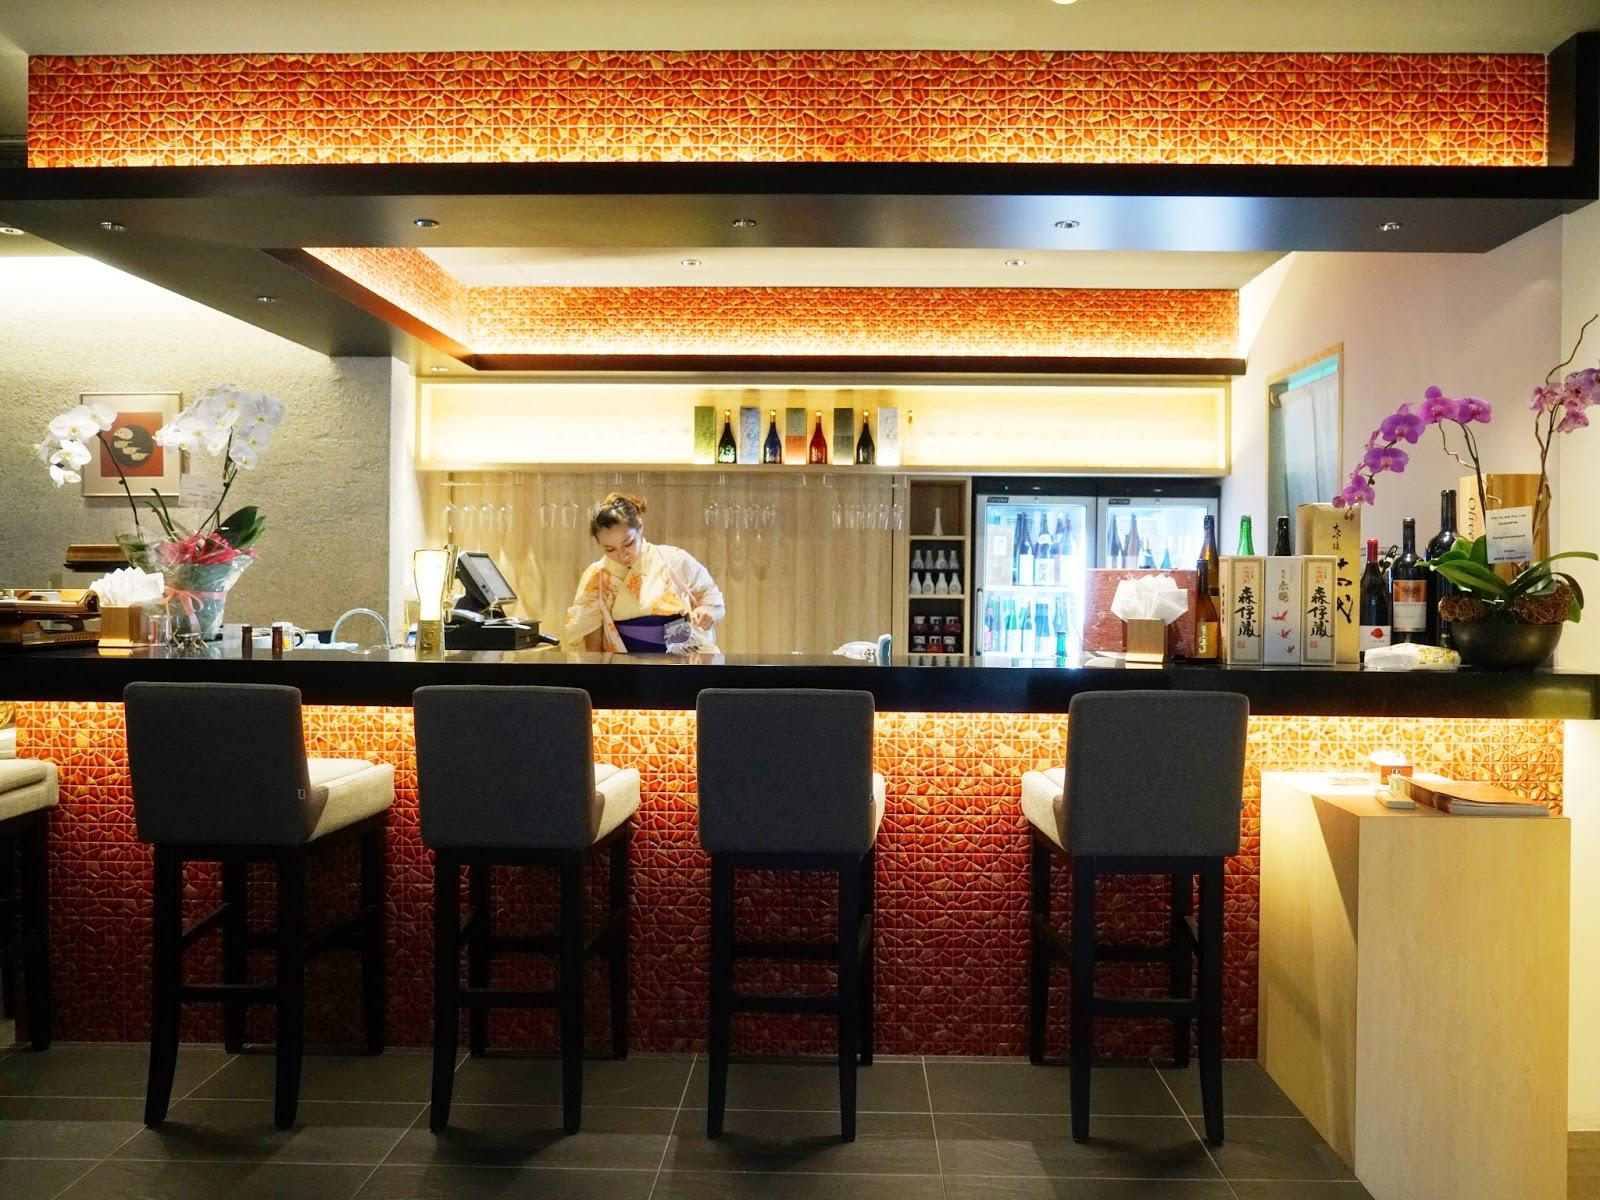 Restaurant Kitchen Regulations exellent restaurant kitchen regulations google search and decorating